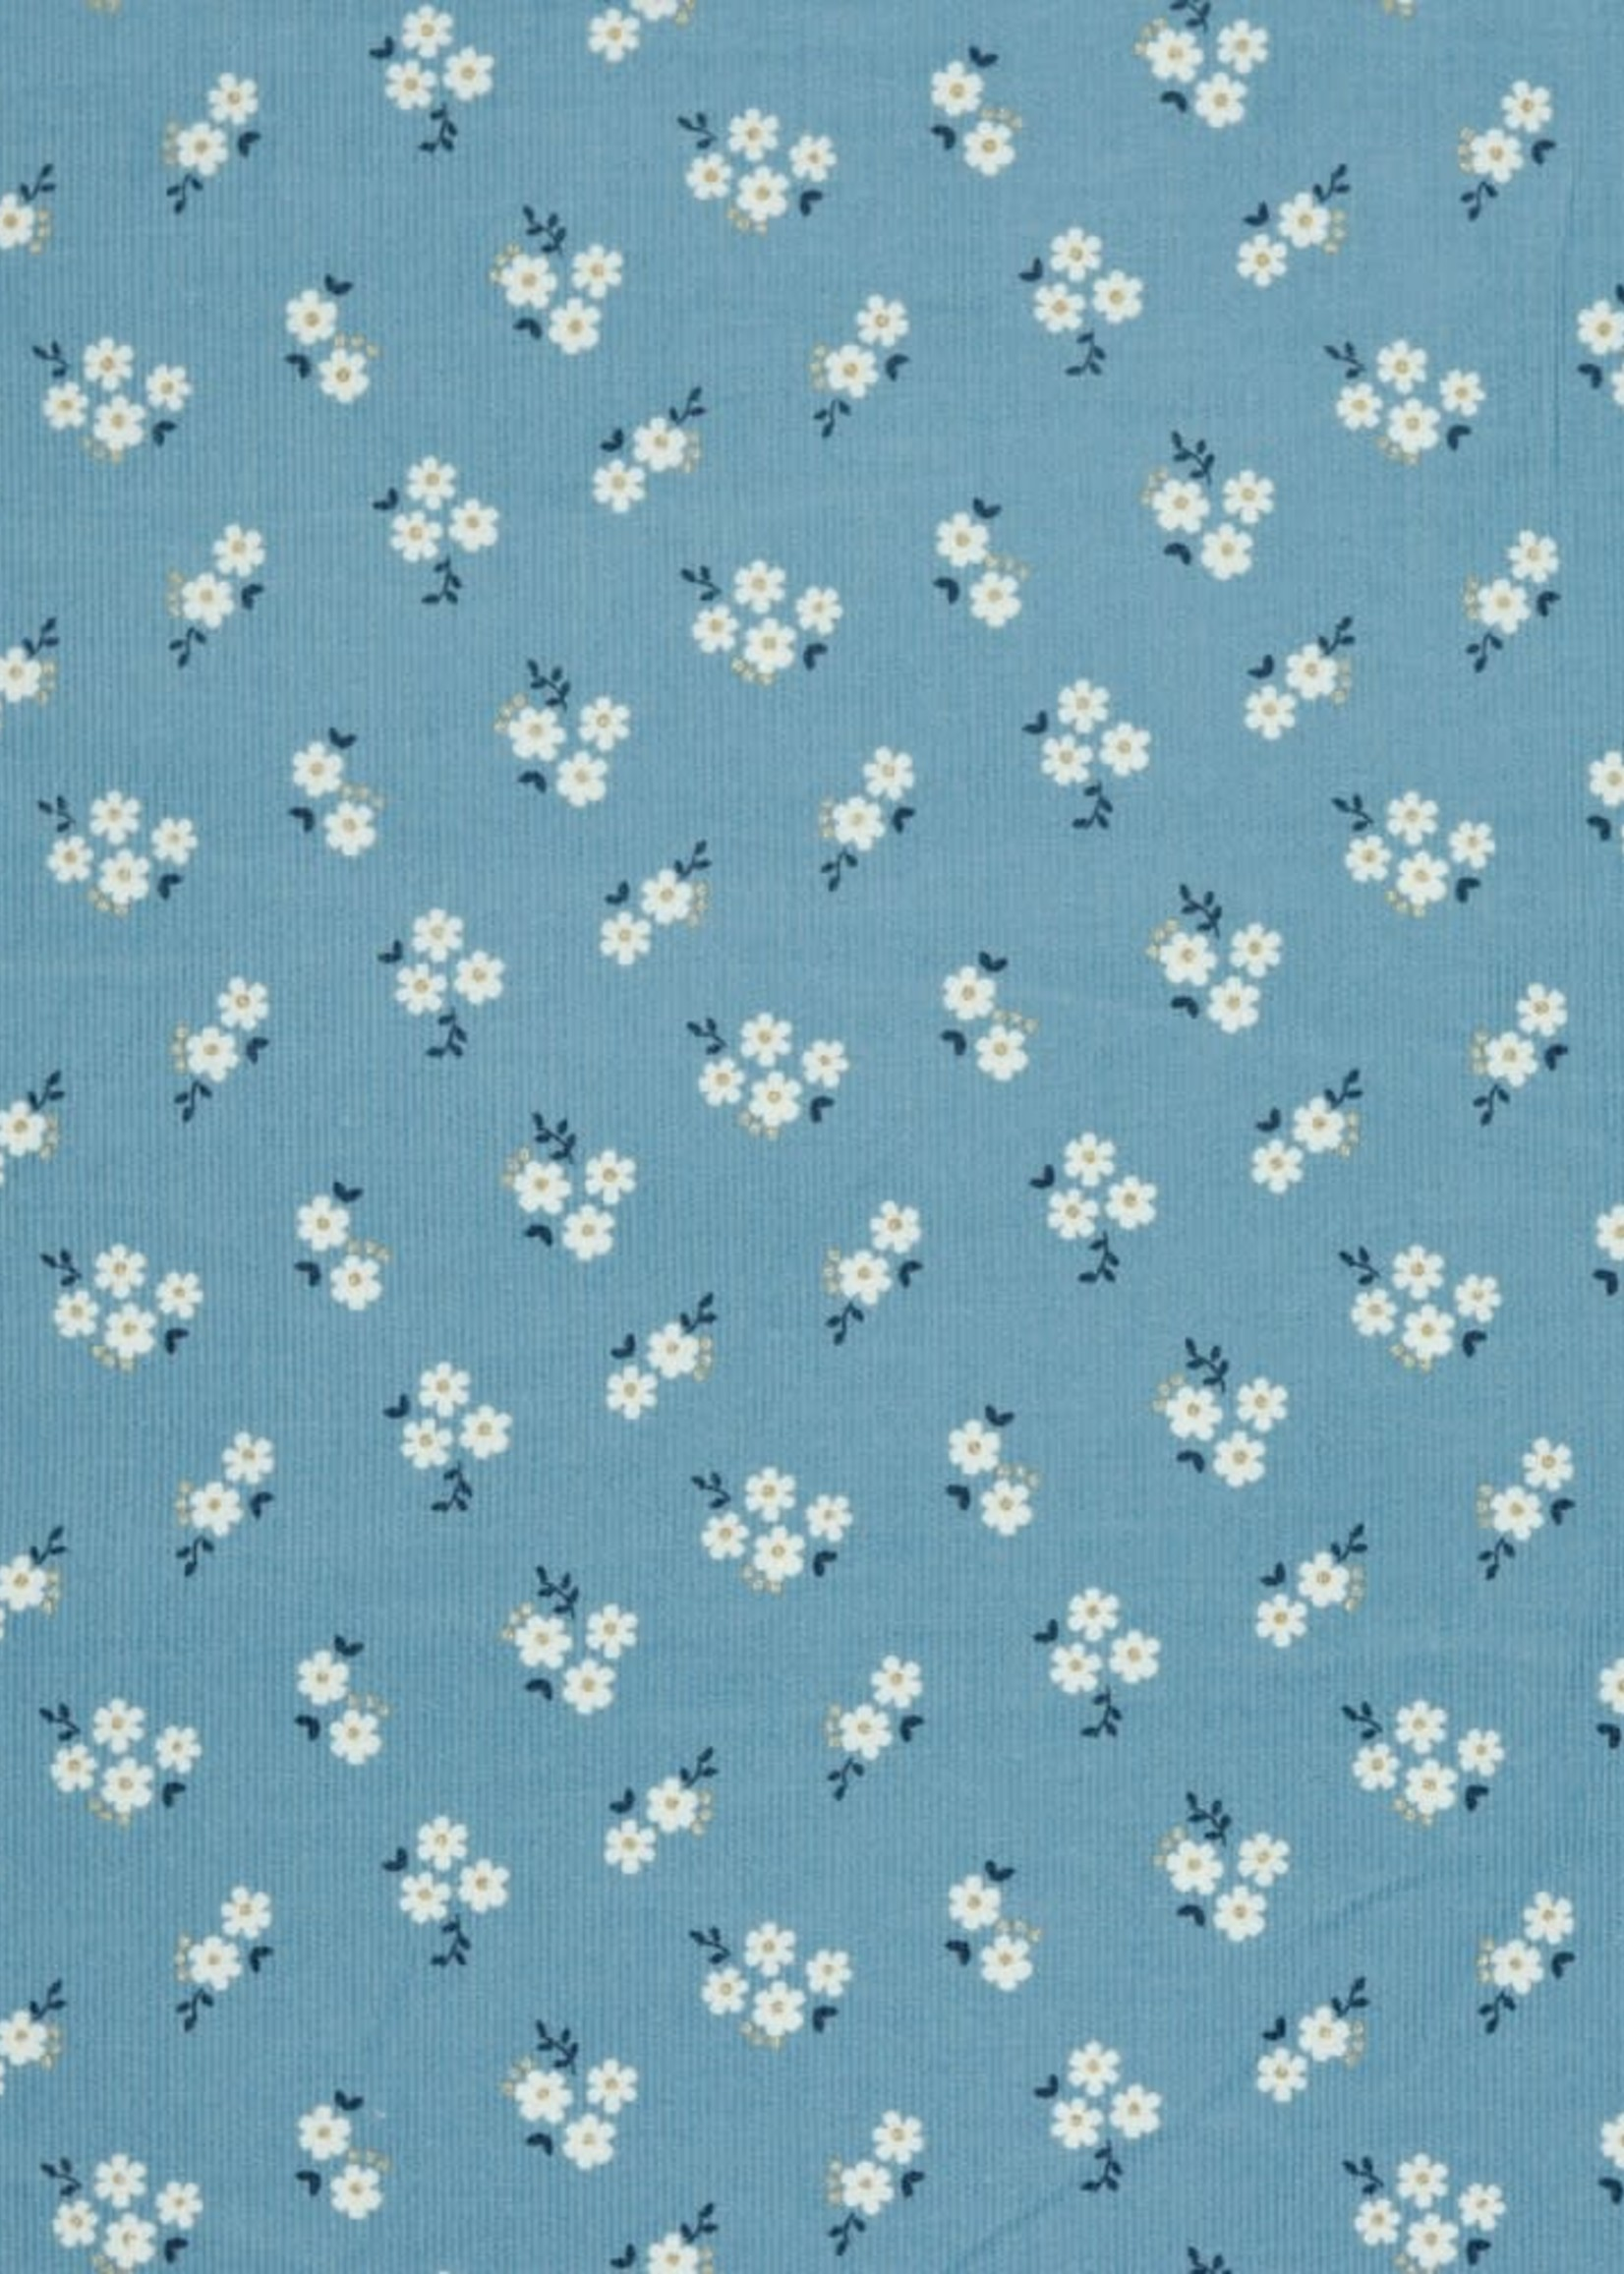 Poppy BABYCORD GLITTER SMALL FLOWERS LIGHT BLUE 100%CO